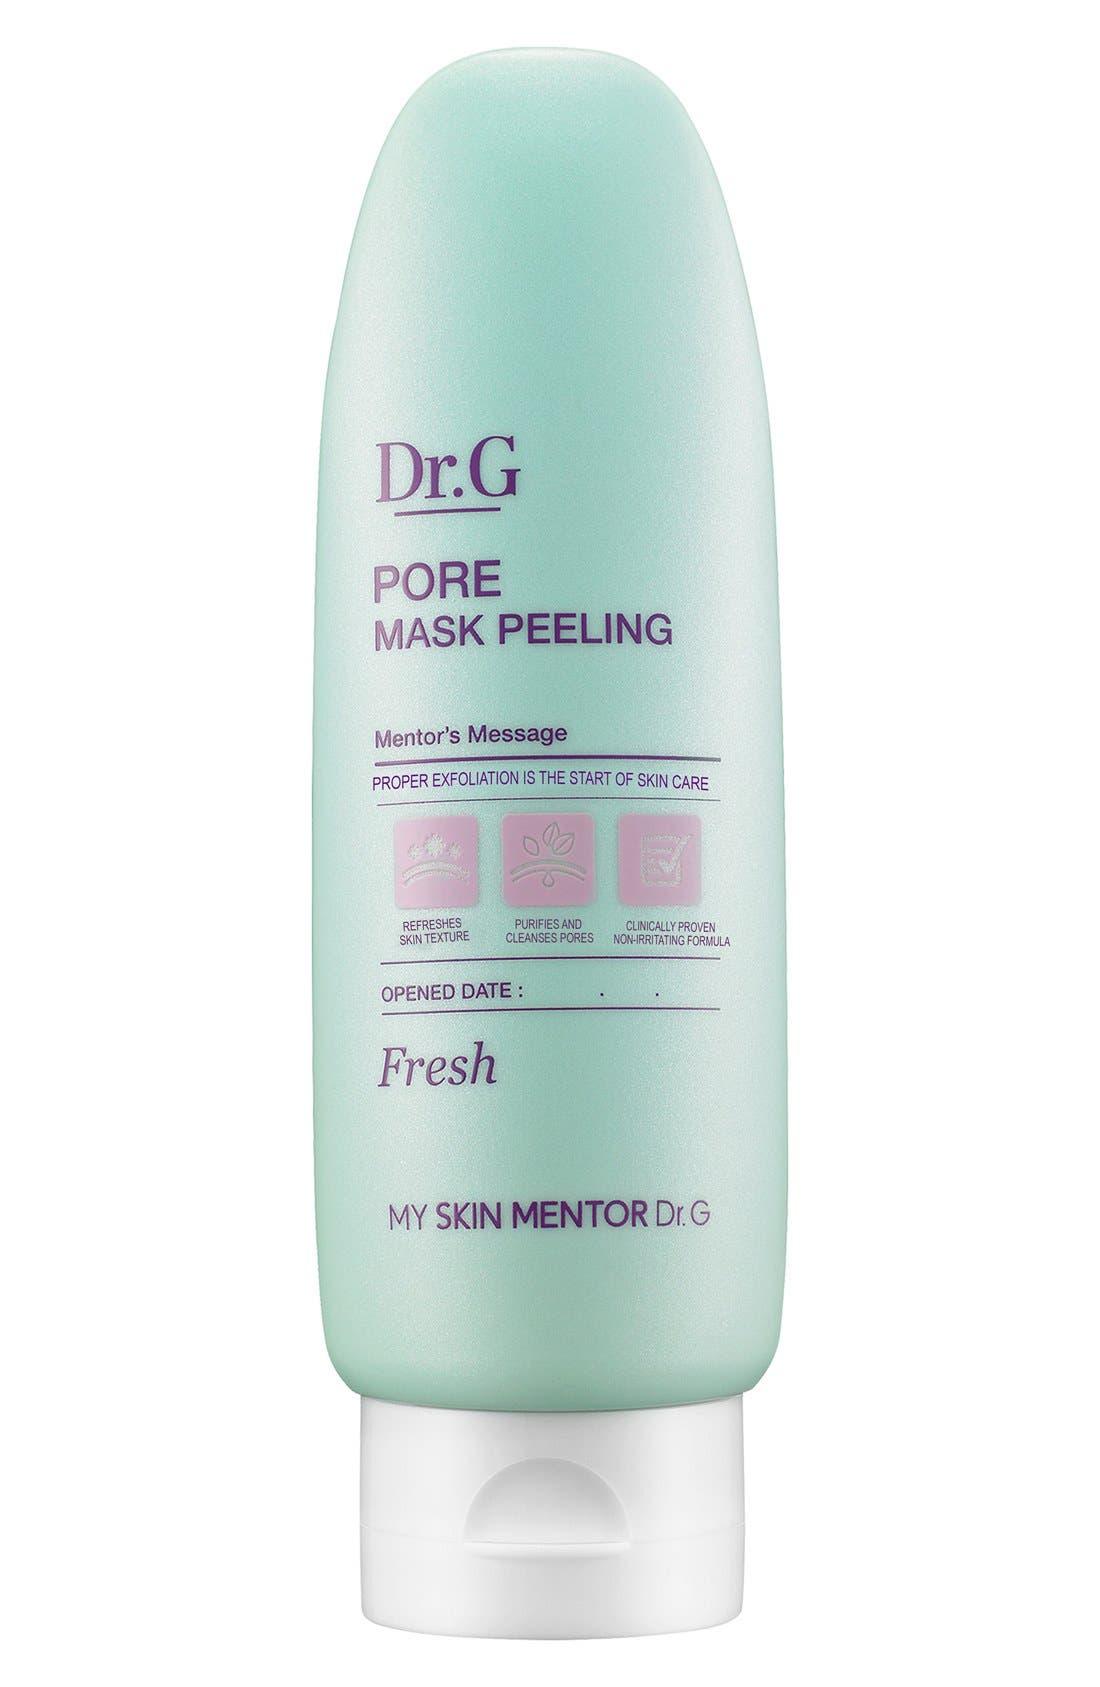 My Skin Mentor Dr. G Beauty Pore Mask